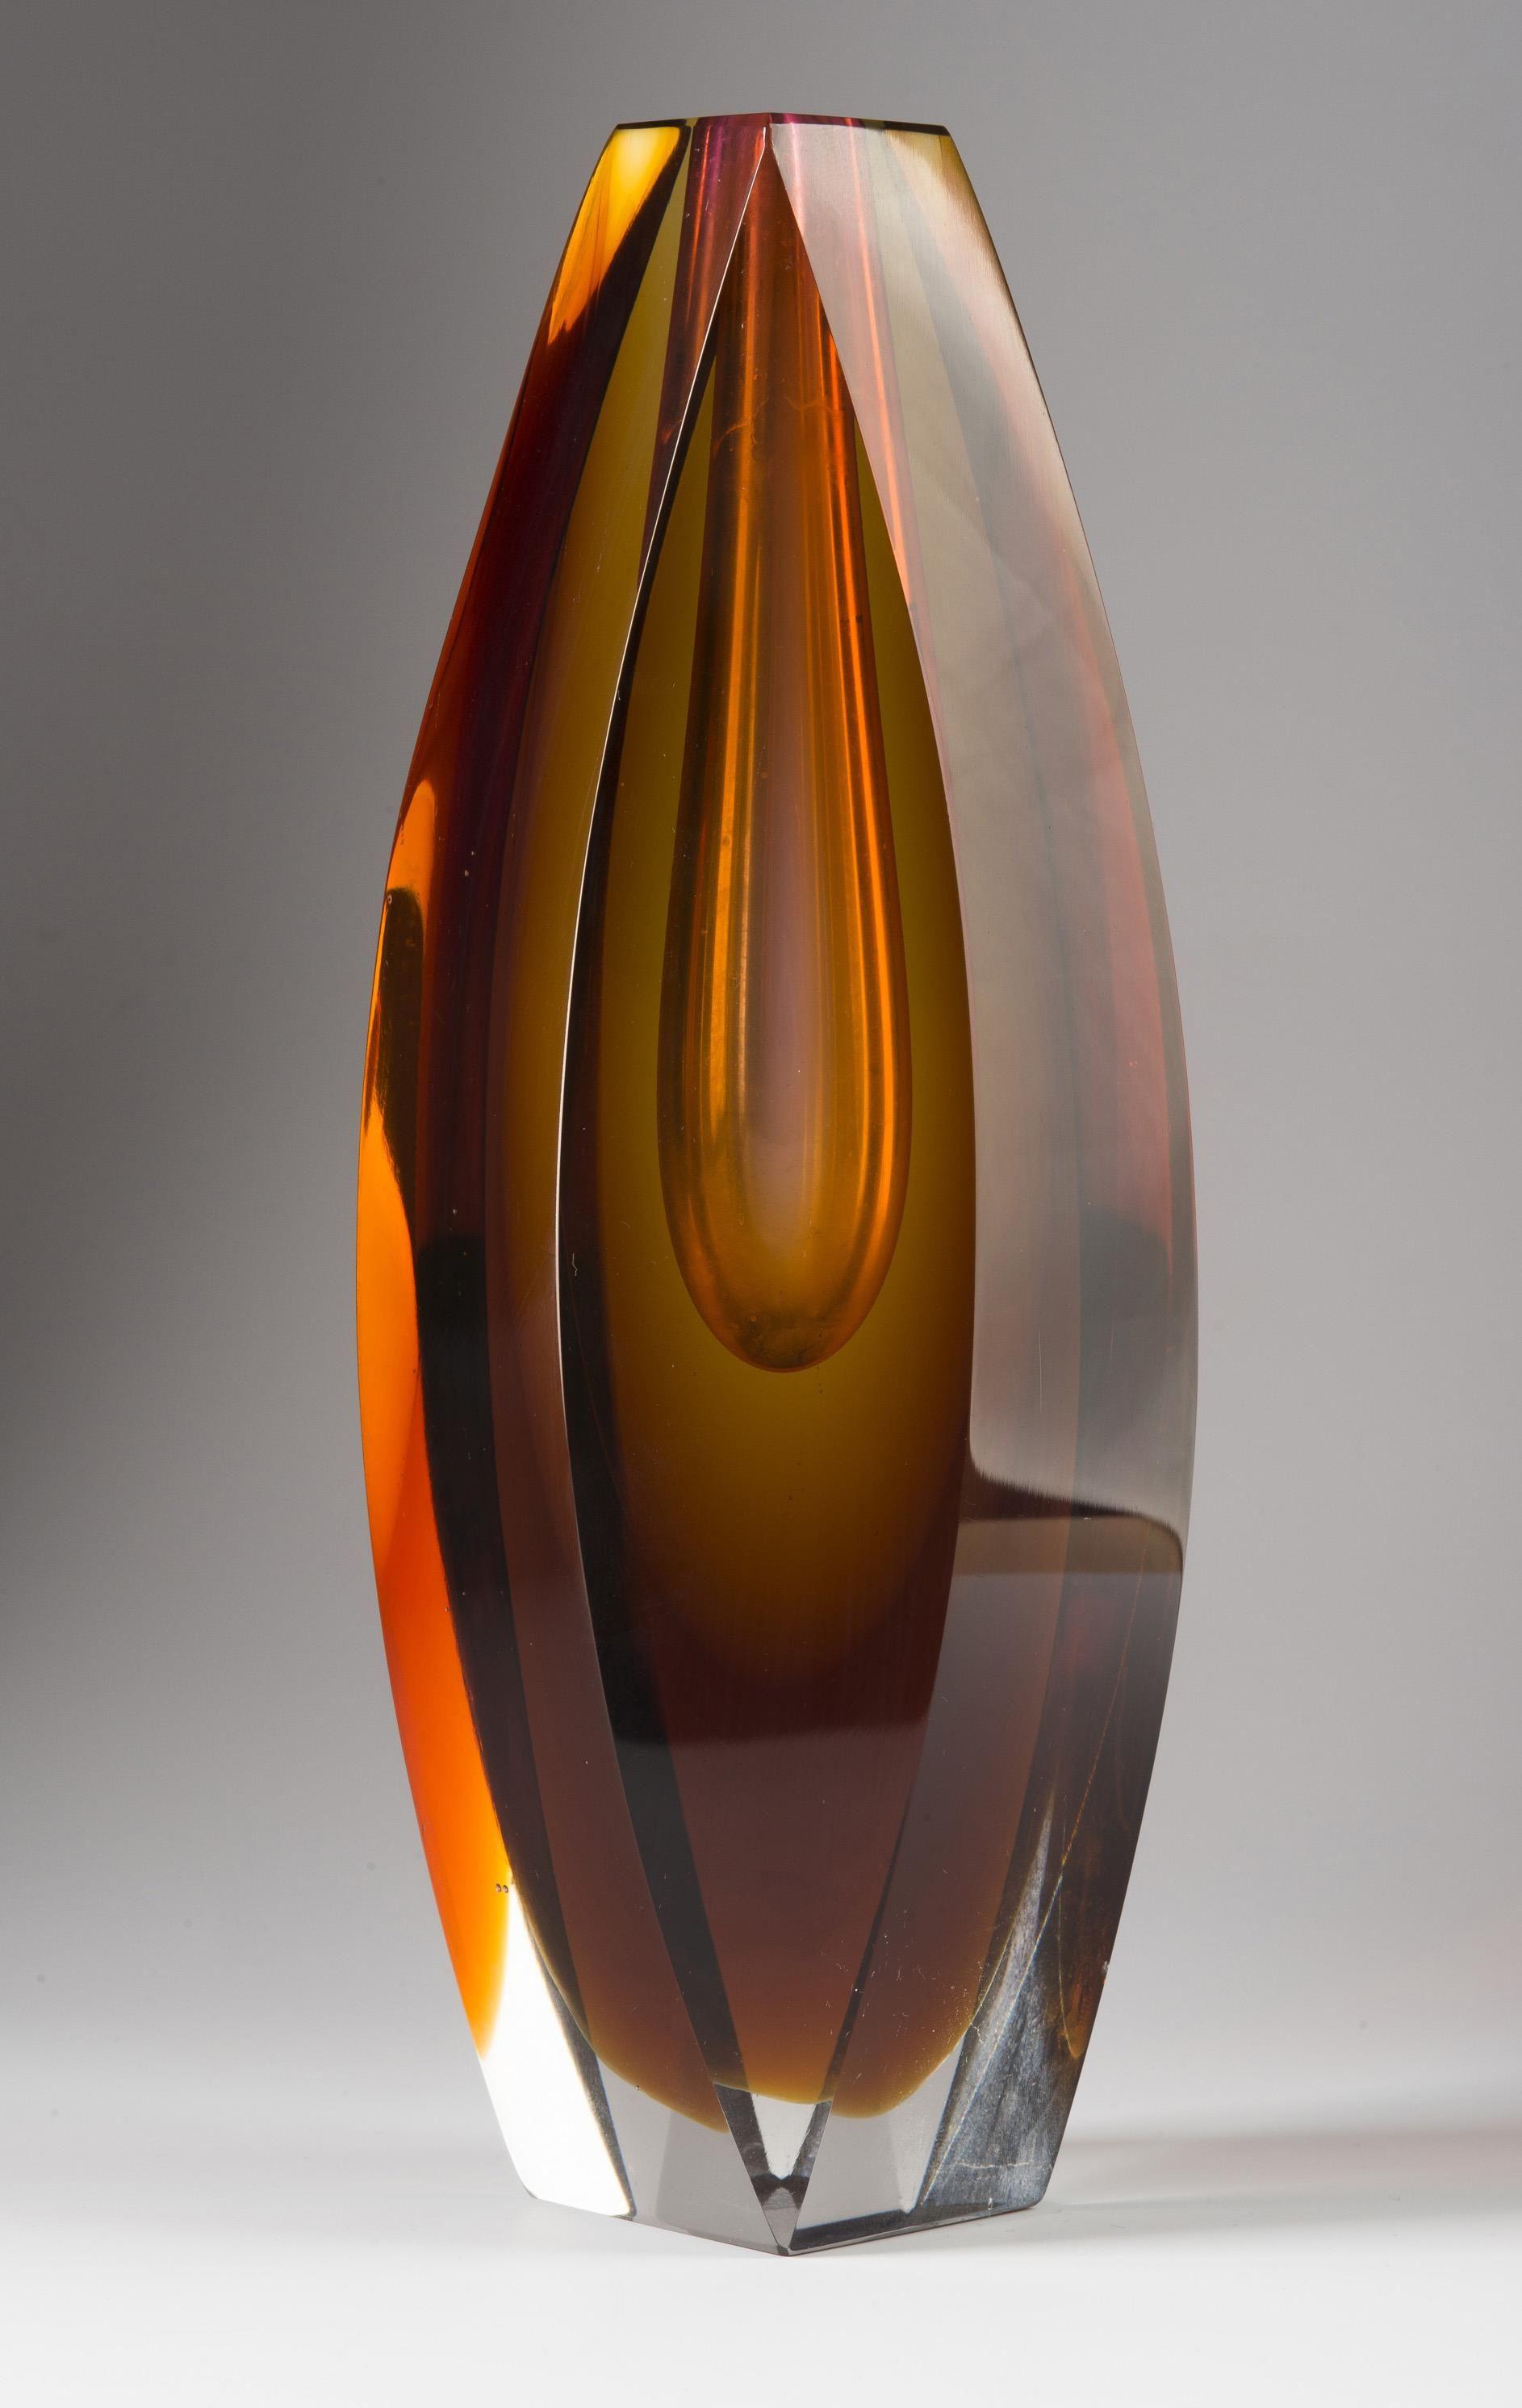 amber colored glass vases of jan kotik sommerso glass vase 60s h 225 cm glassworks zelezny throughout jan kotik sommerso glass vase 60s h 225 cm glassworks zelezny brod eisenbrod czechoslovakia